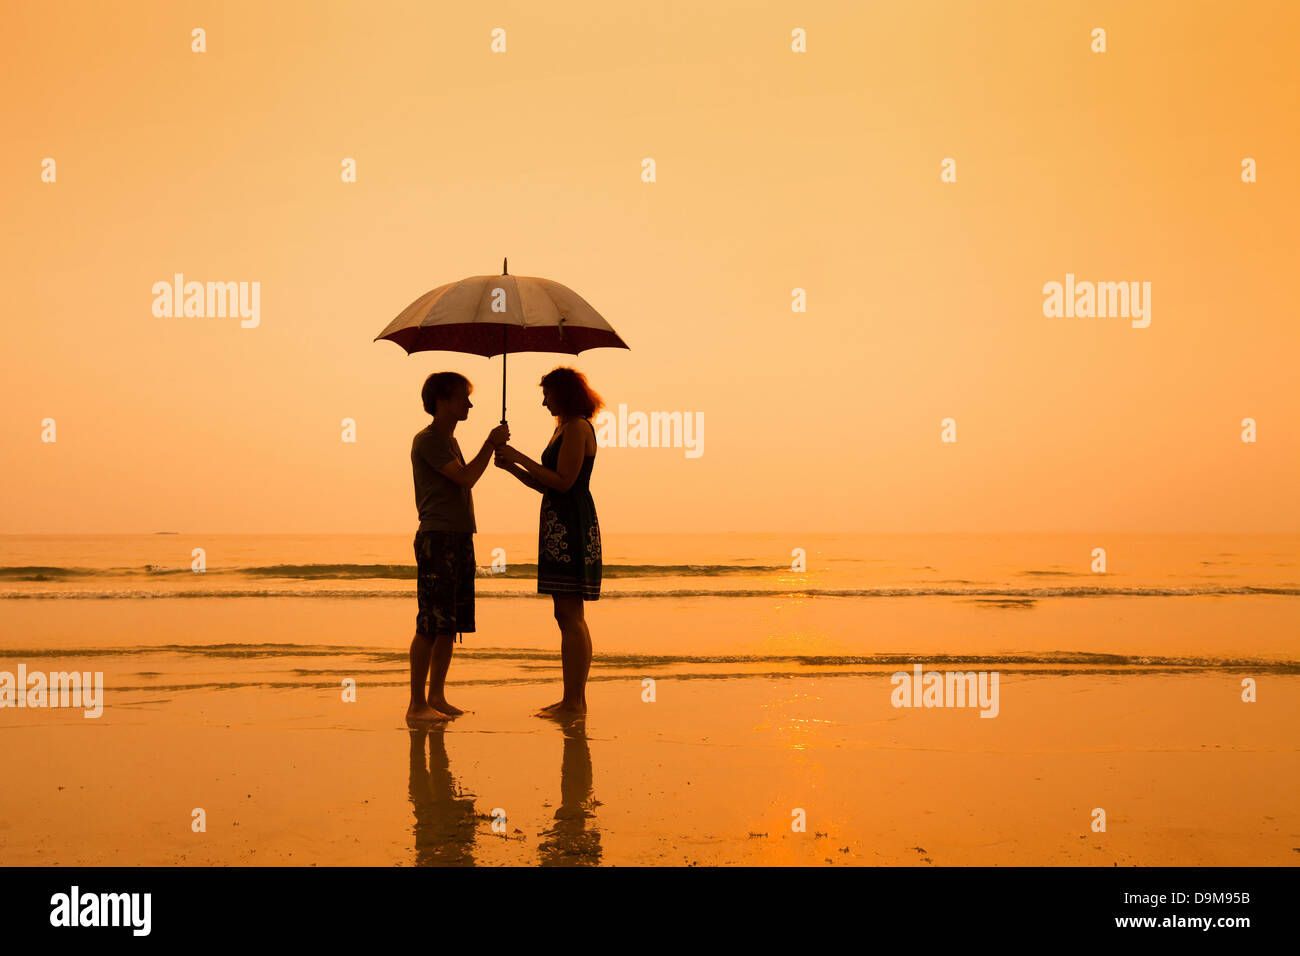 Familia en la playa, las siluetas de la pareja con sombrilla Imagen De Stock